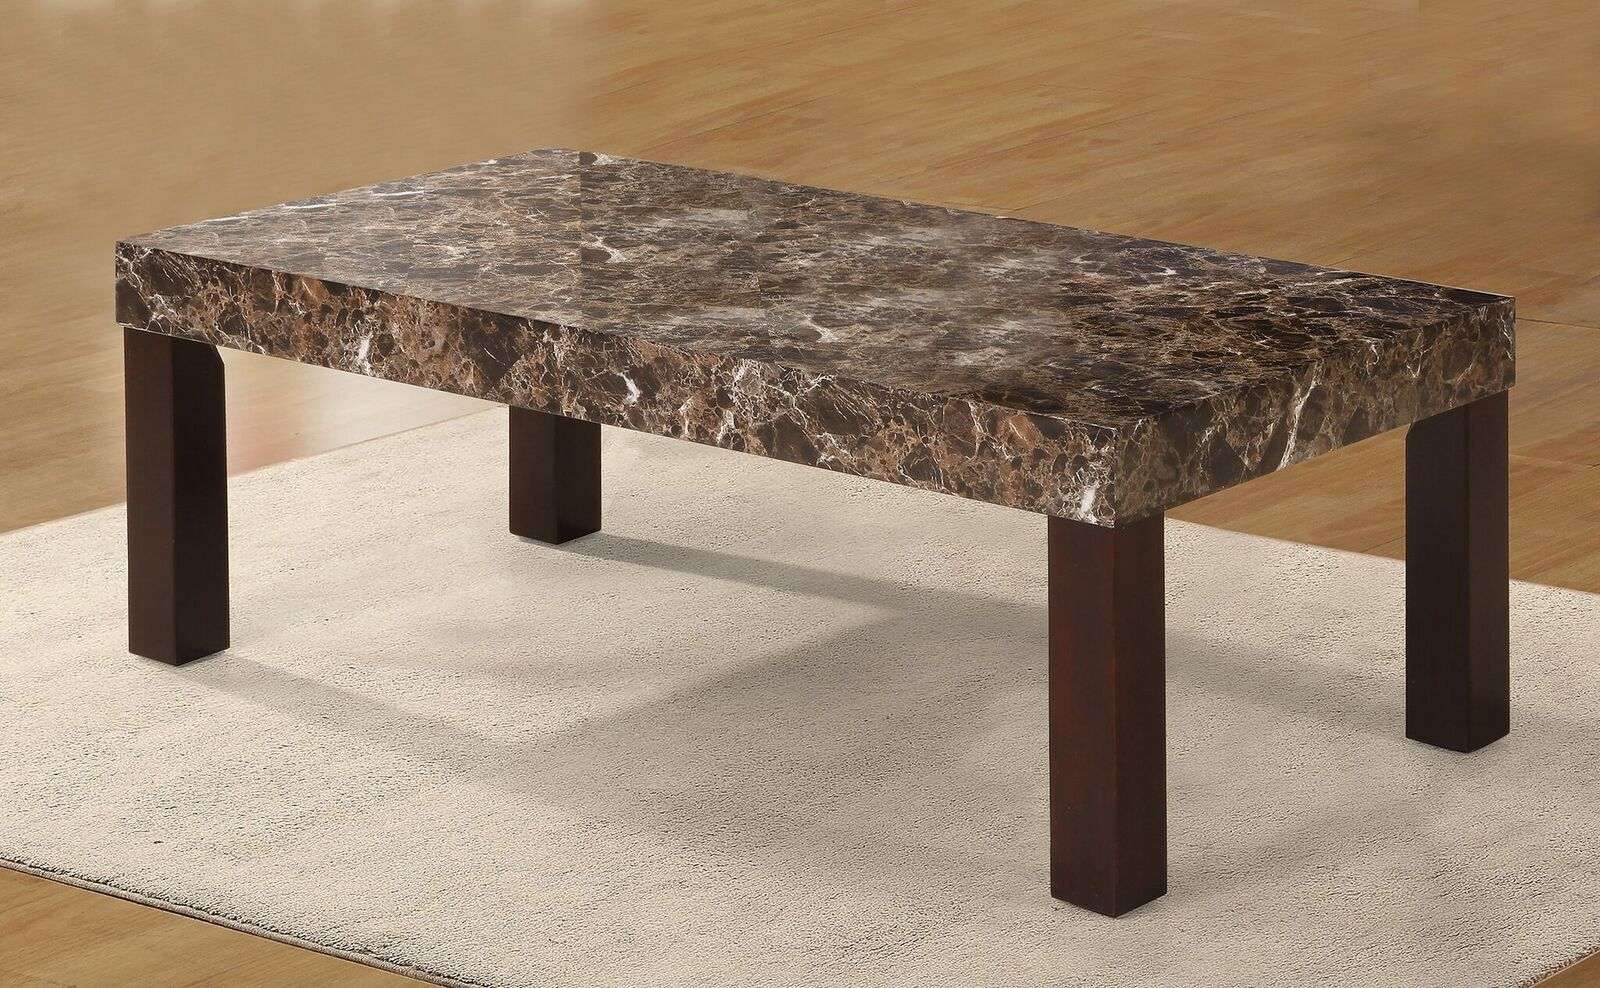 Mccullum Faux Marbelized Granite Coffee Table